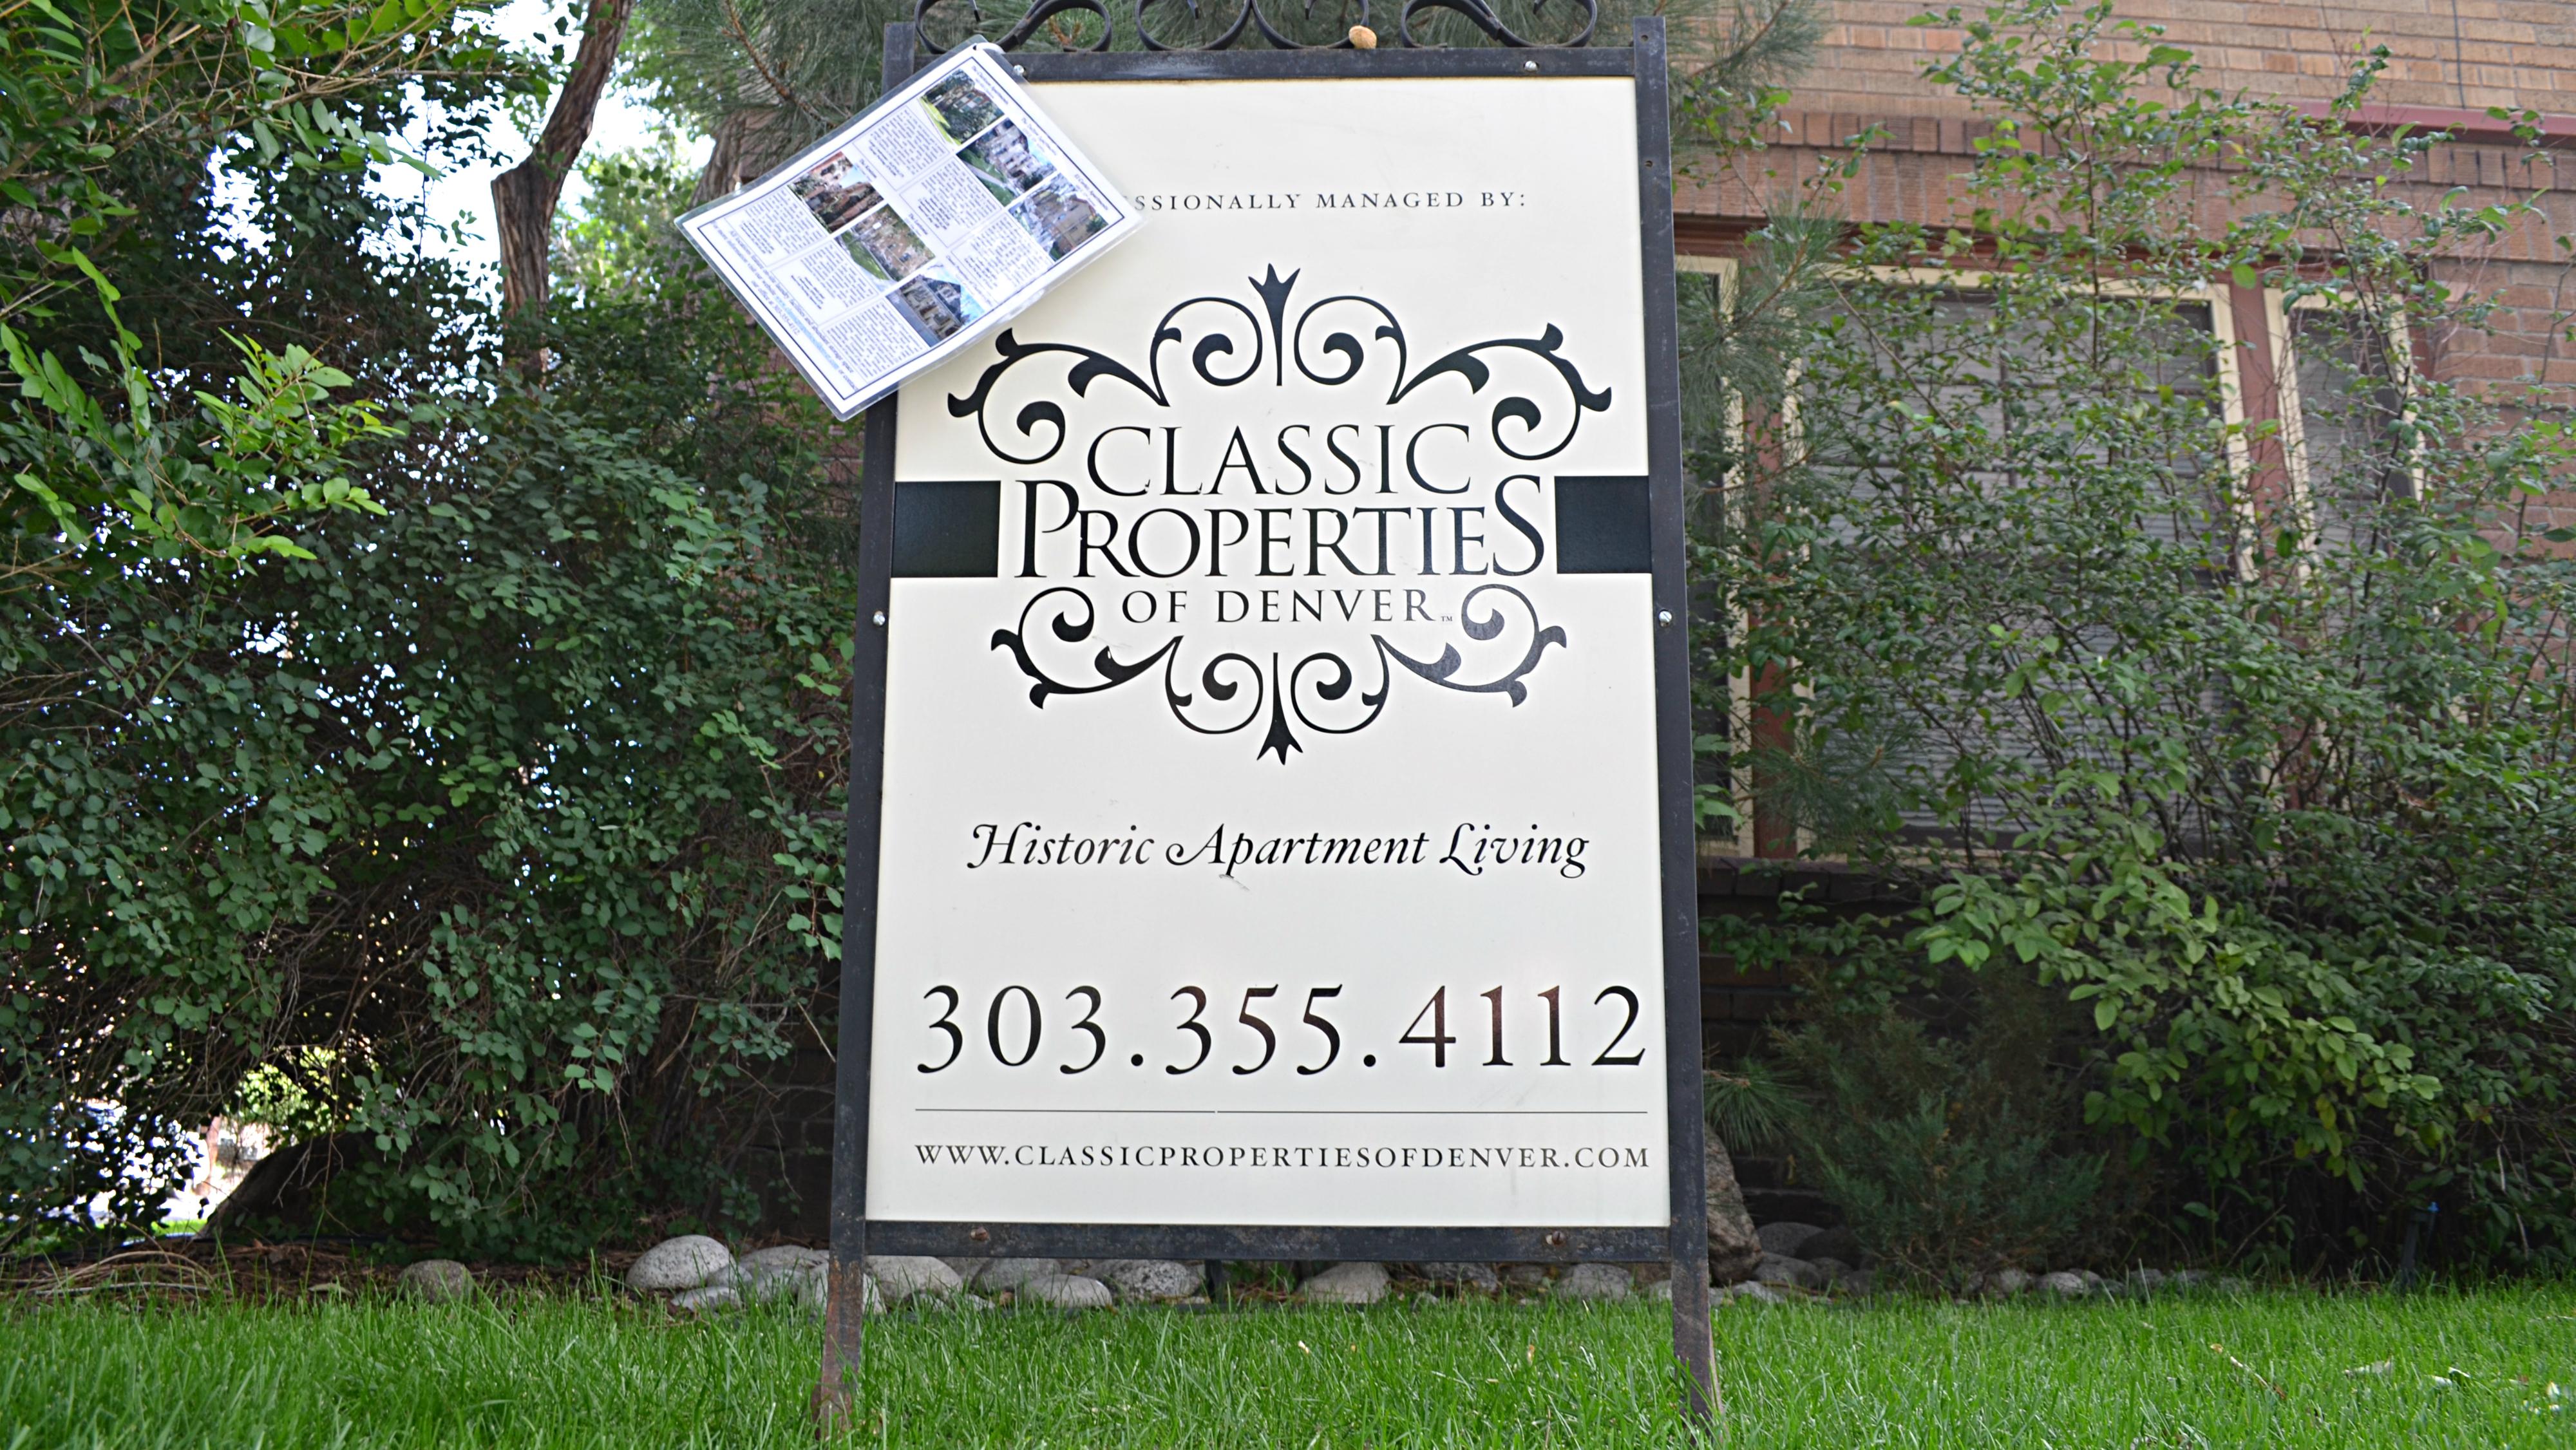 Photo: Apartment rental sign